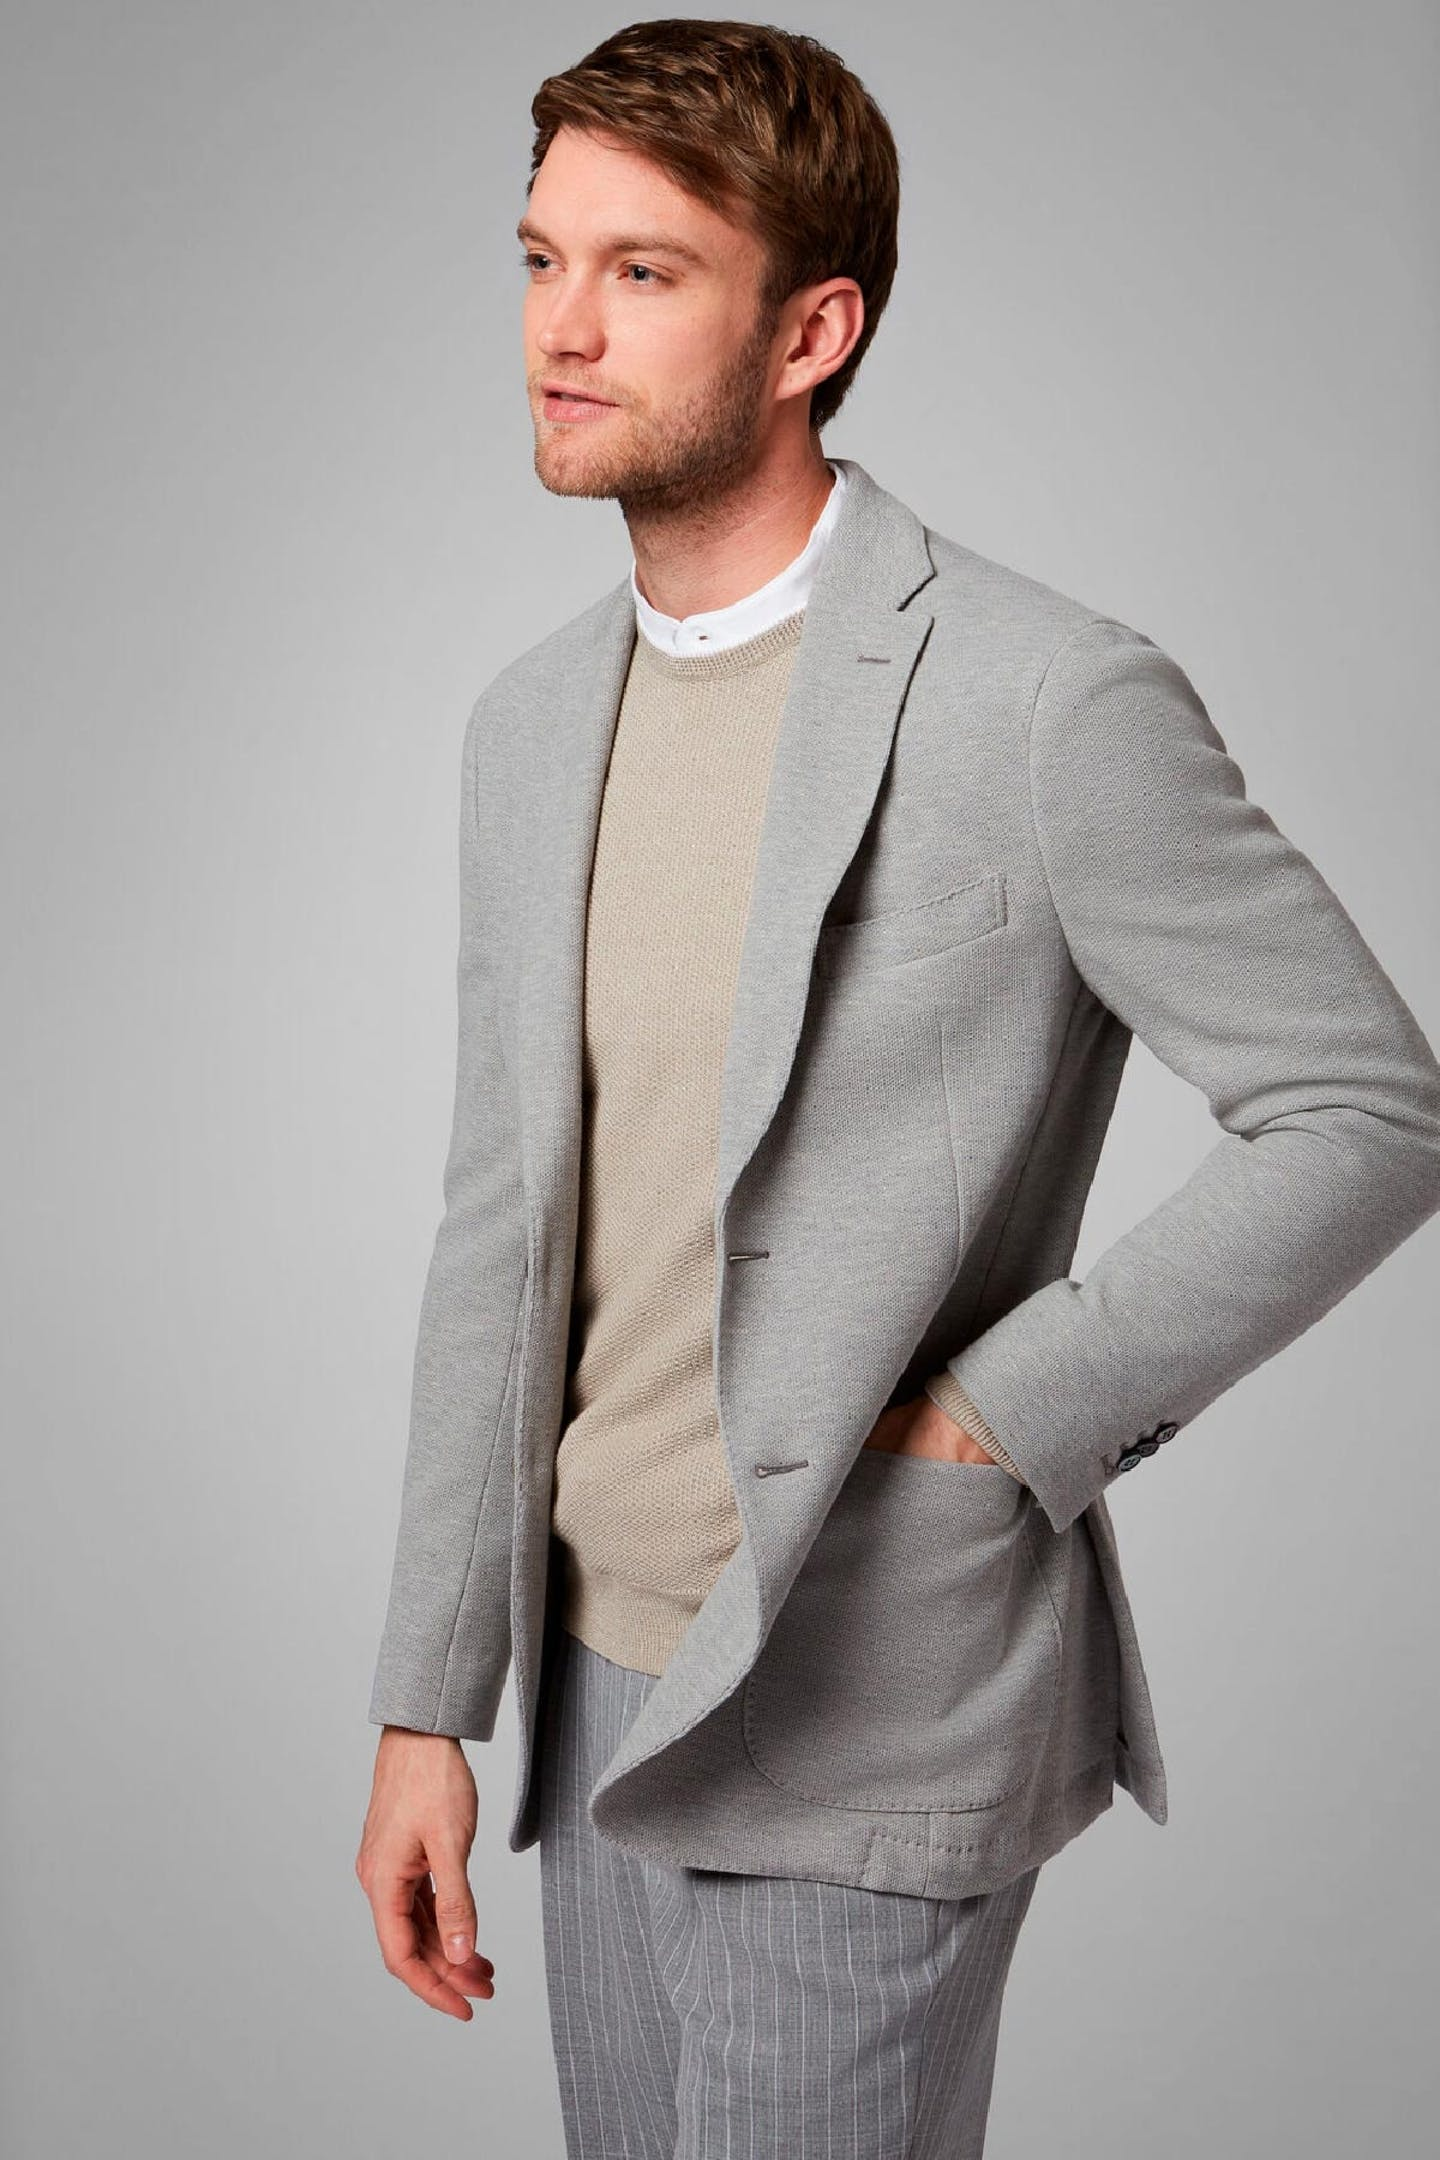 Boggi Milano B-Jersey Bari blazer in grey cotton crepe jersey  BO20P043402